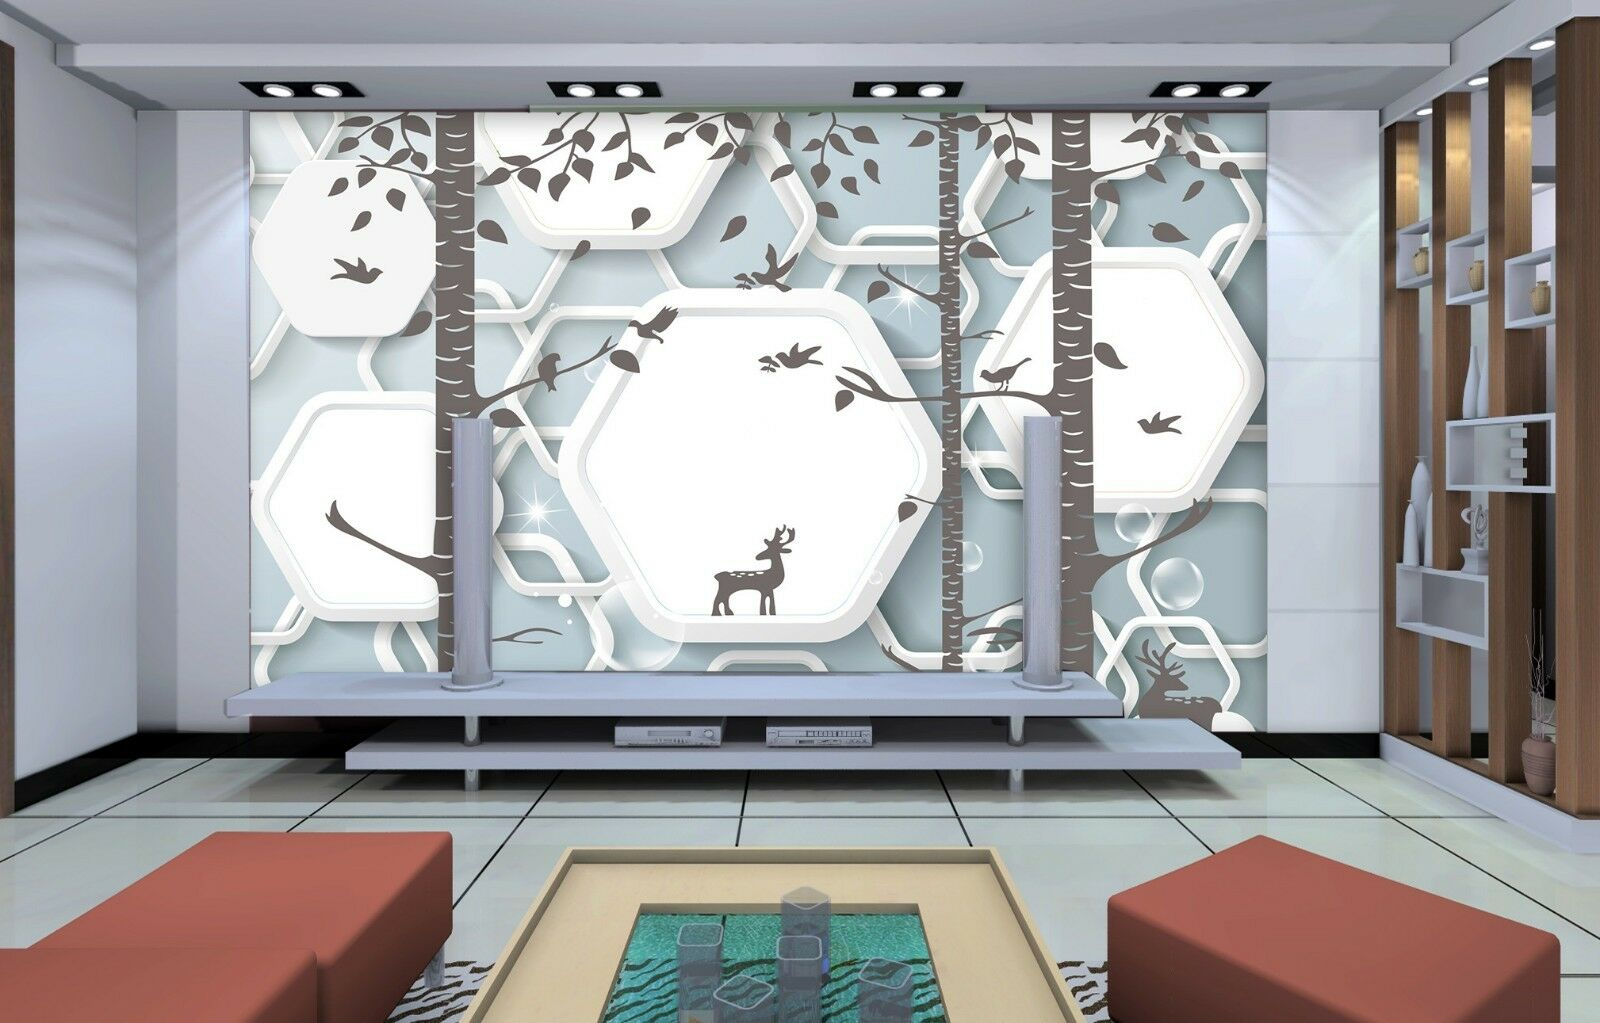 3D Graffiti trunk Deer Wall Paper Print Decal Wall Deco Indoor wall Mural